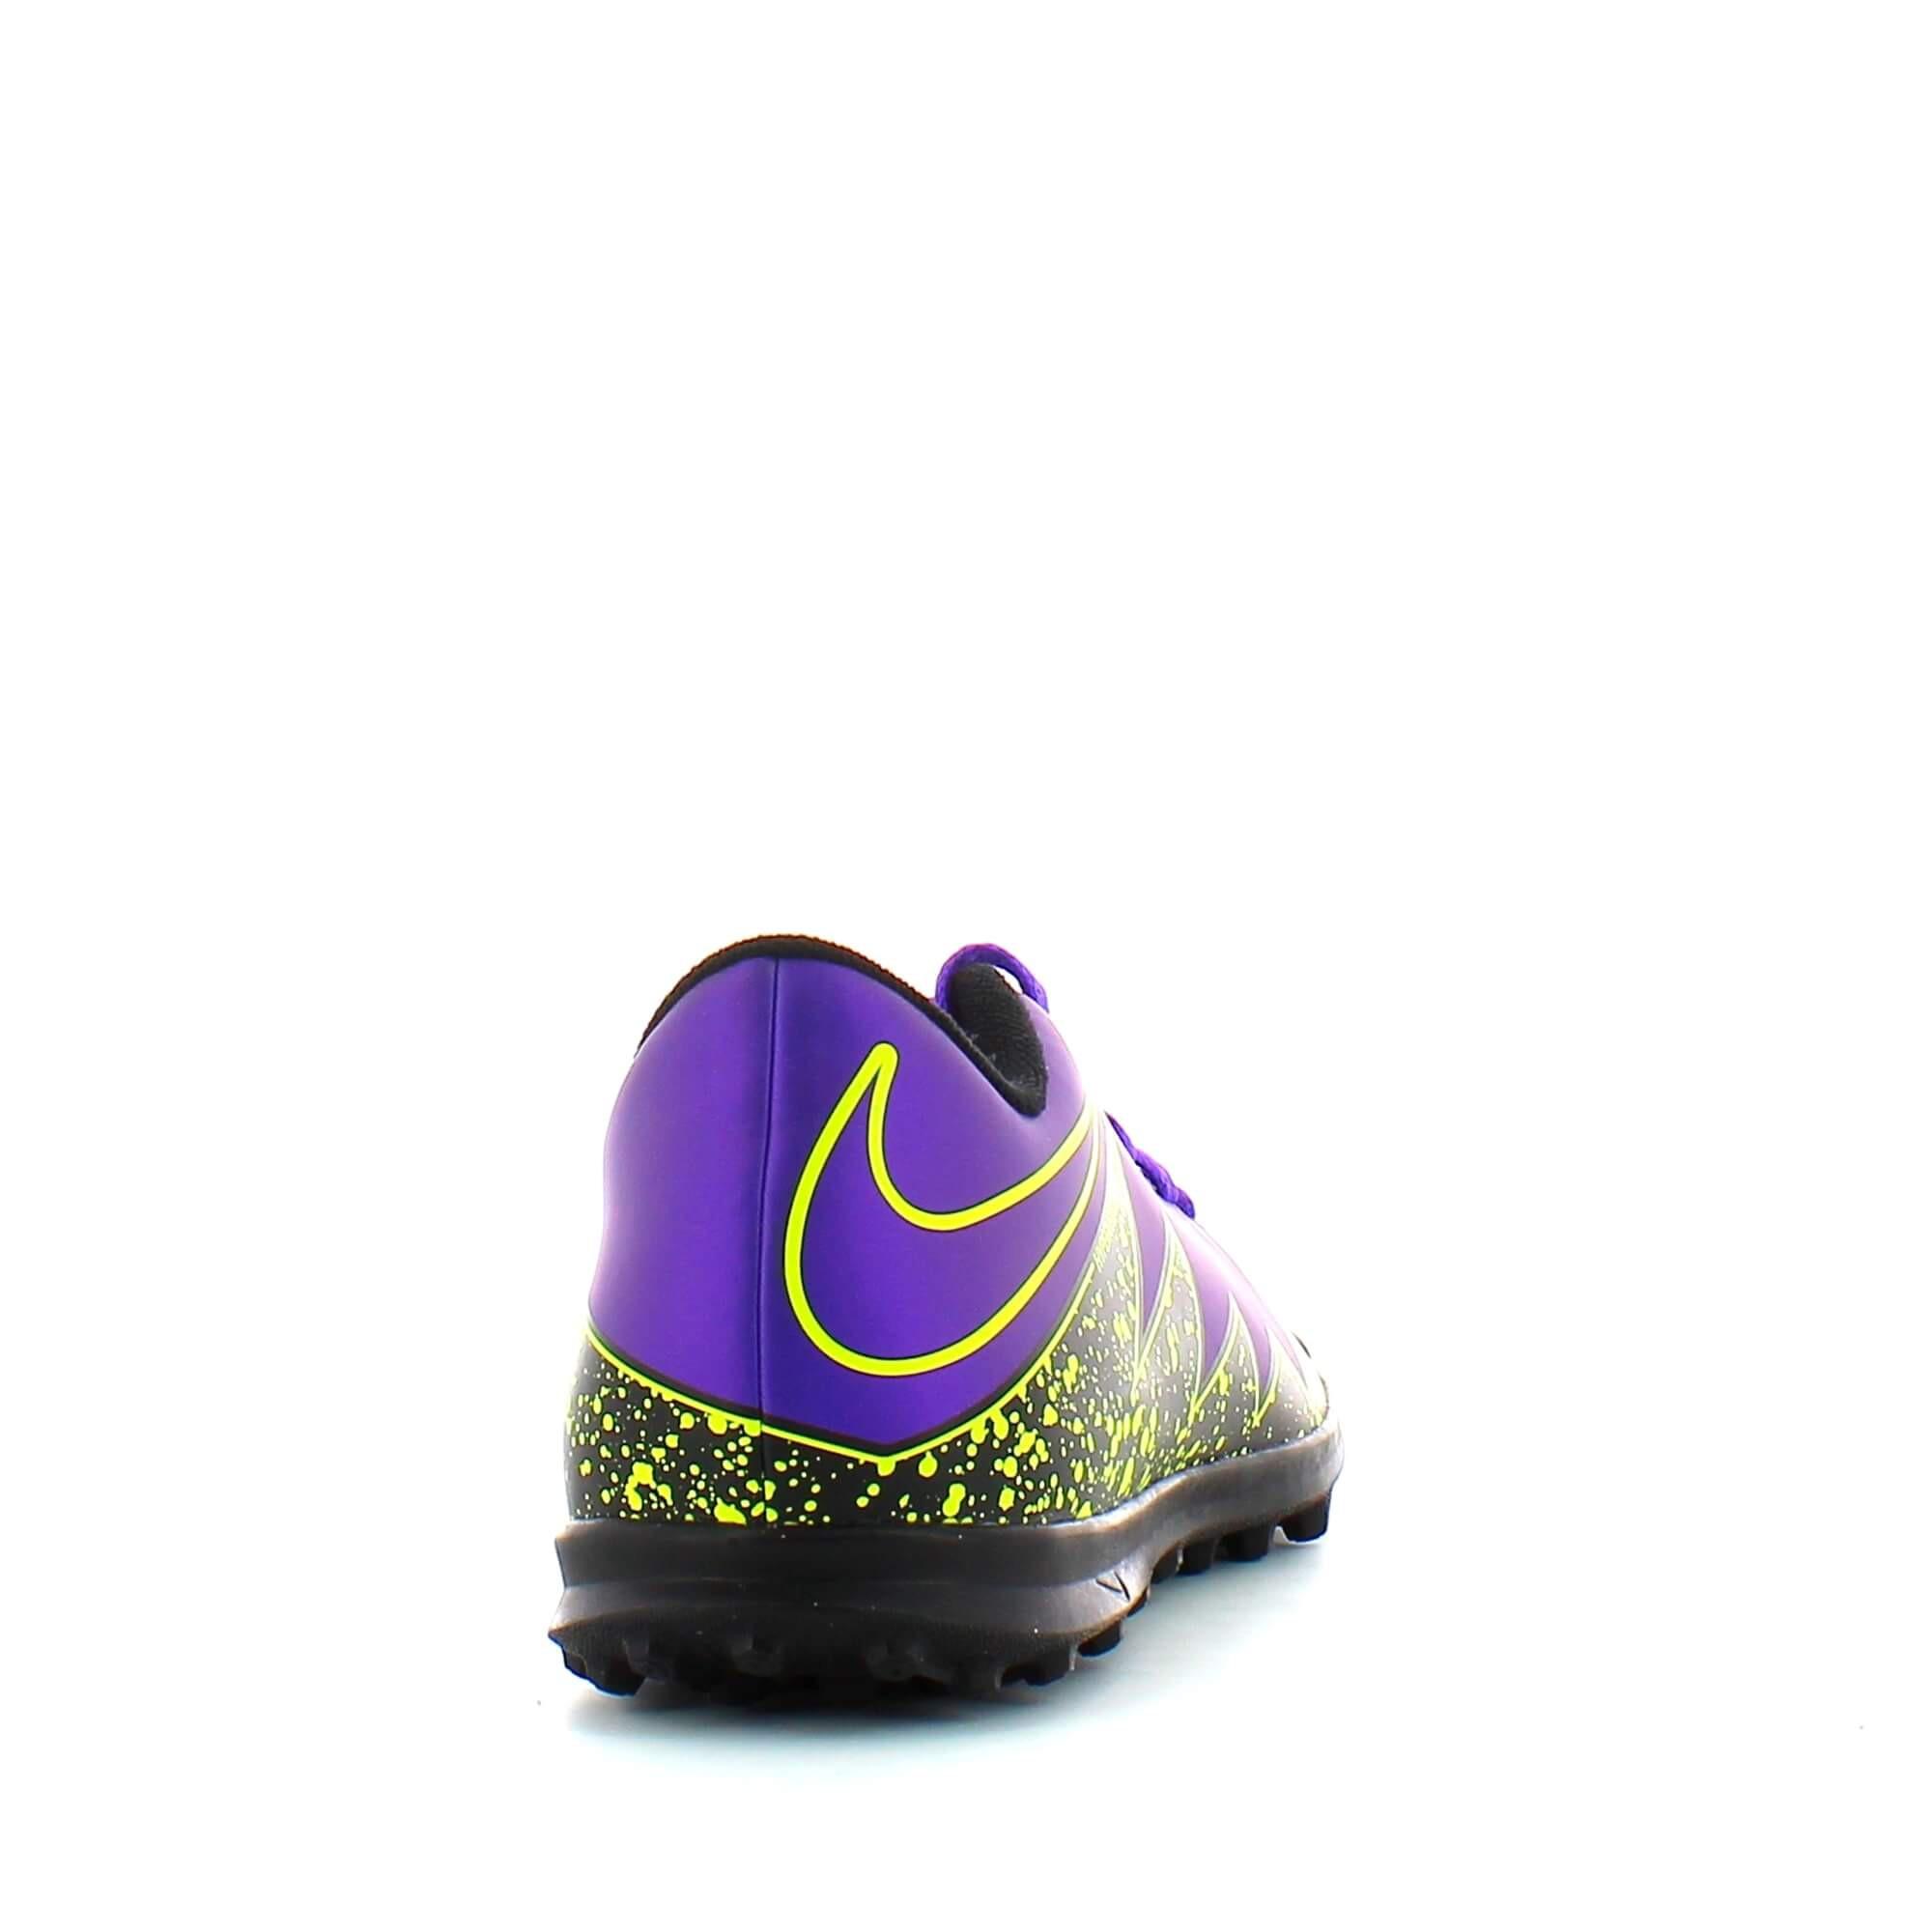 eba5f2822c Botas Fútbol Nike Hypervenom Phade II Turf Morado Hombre - Deportes Moya